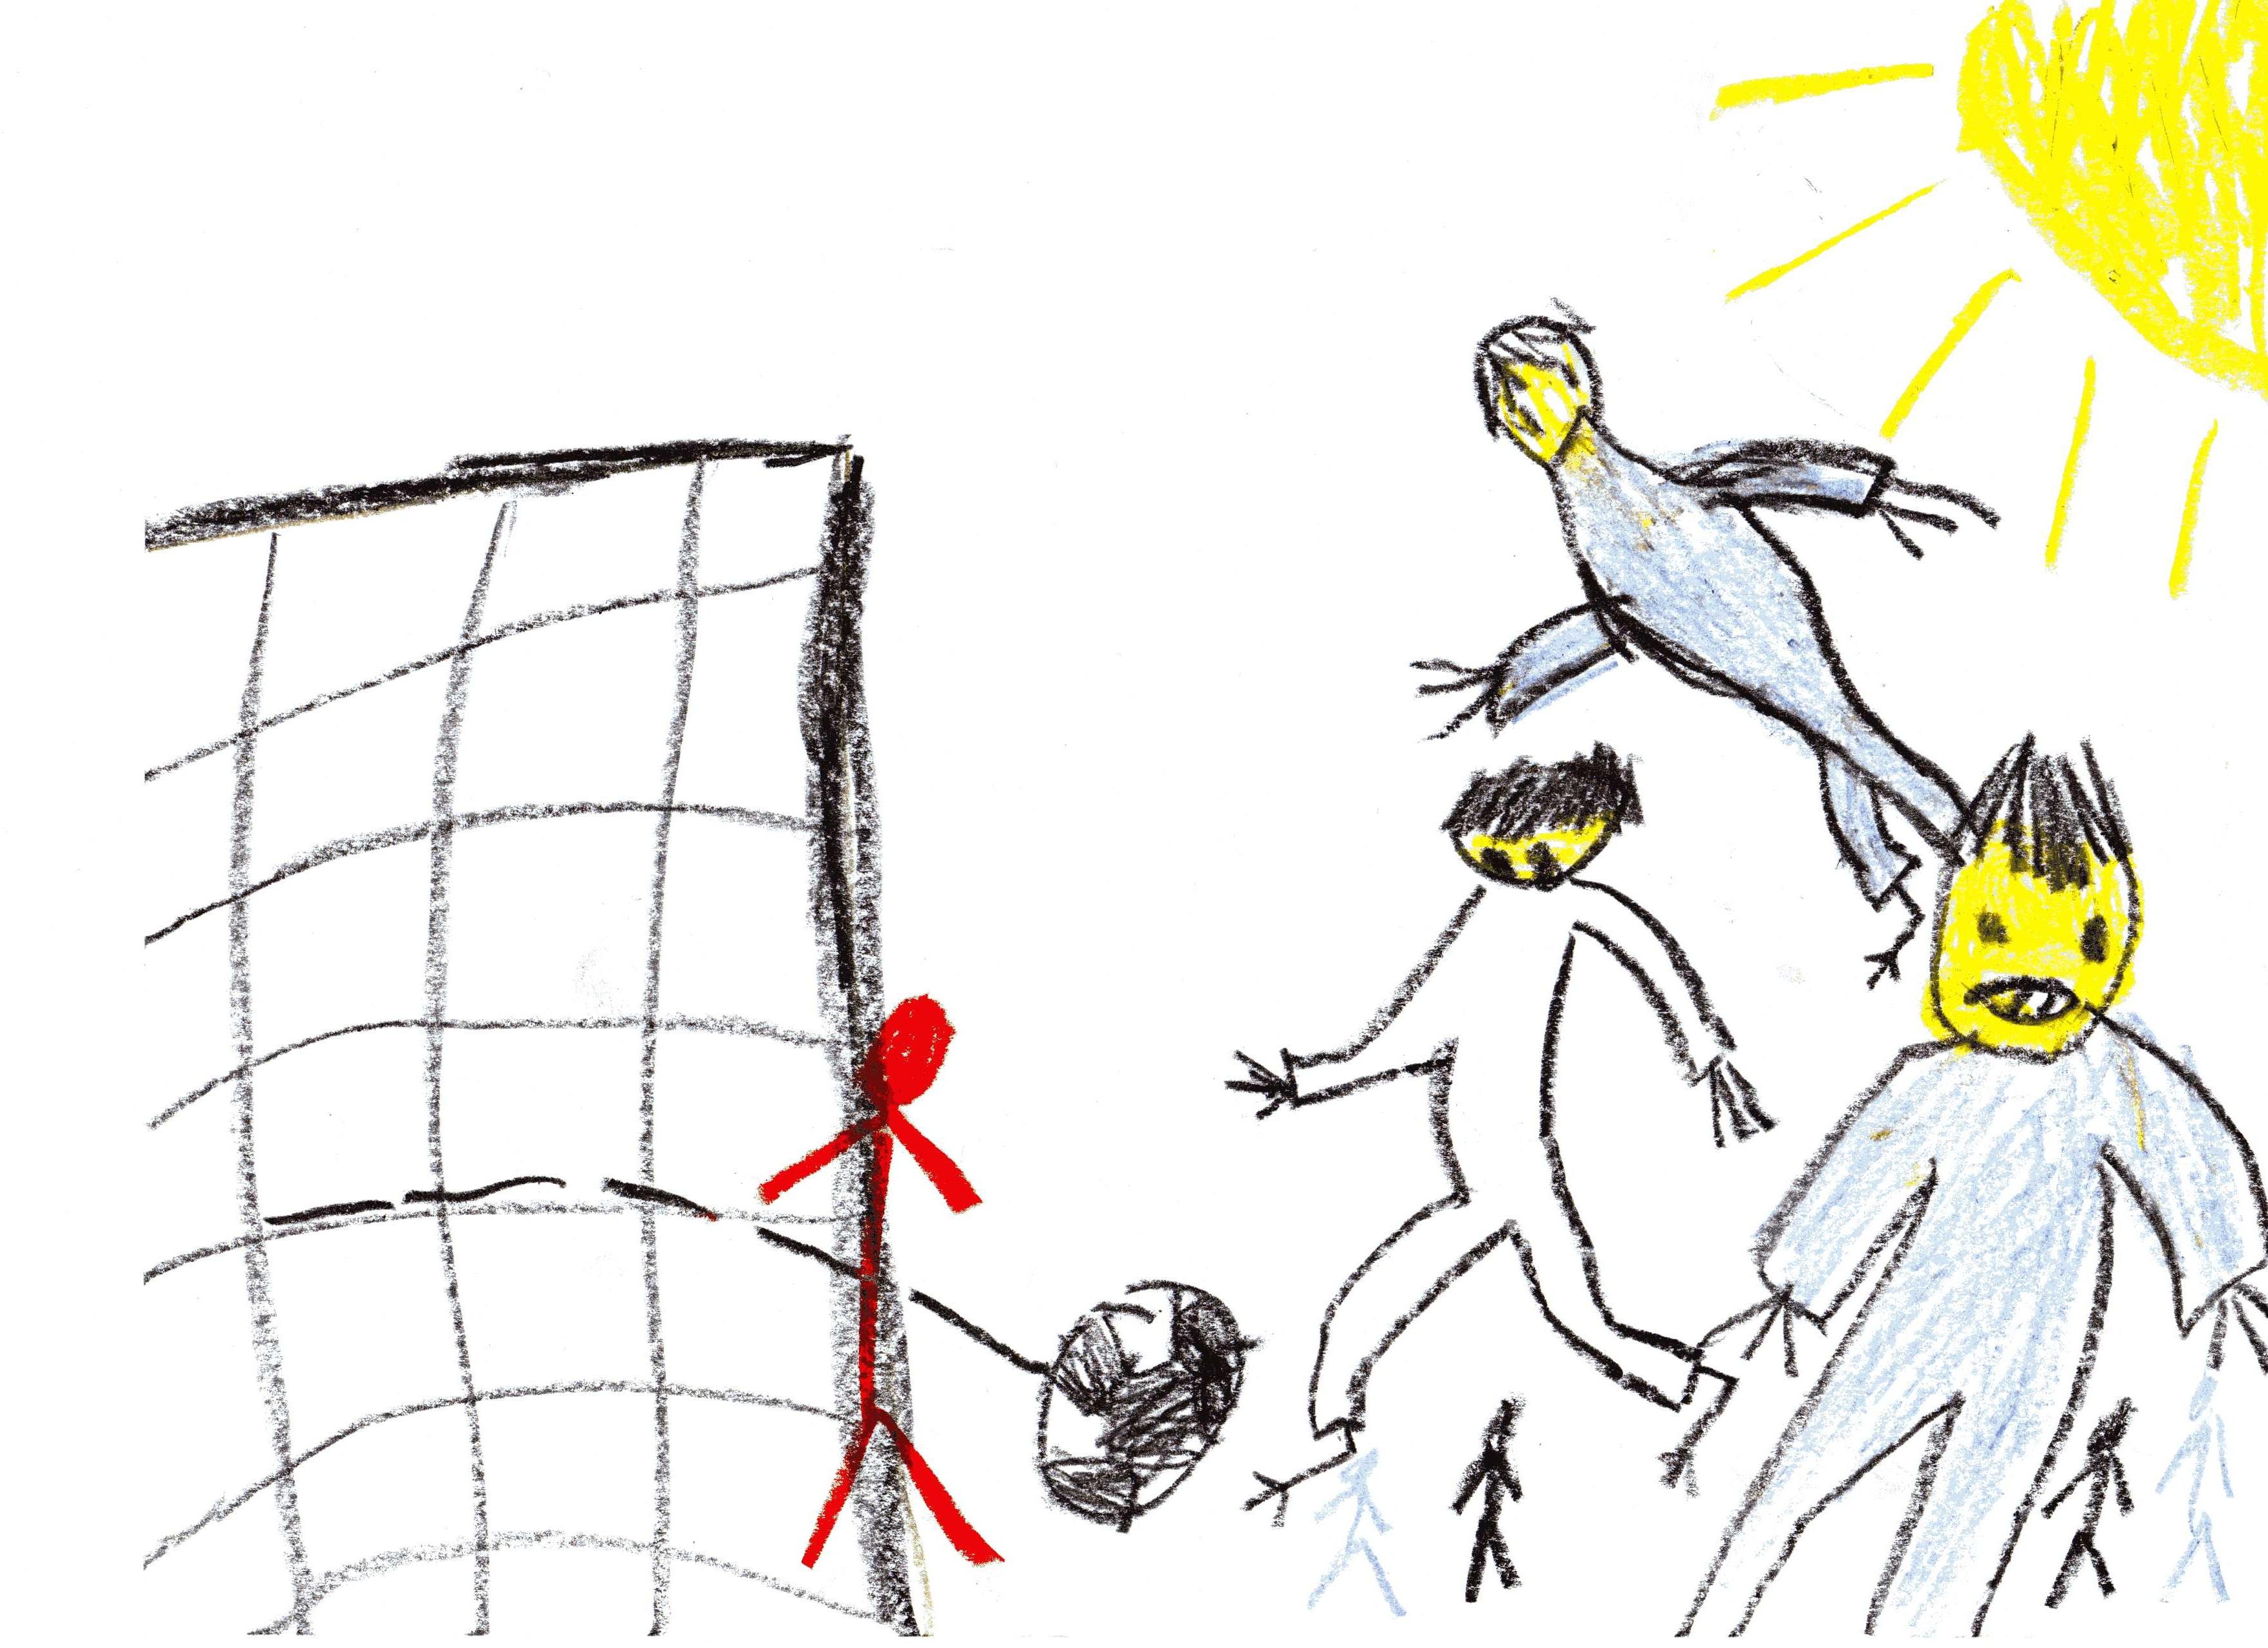 3509x2550 Global Future Of Women's Football Soccer Politics